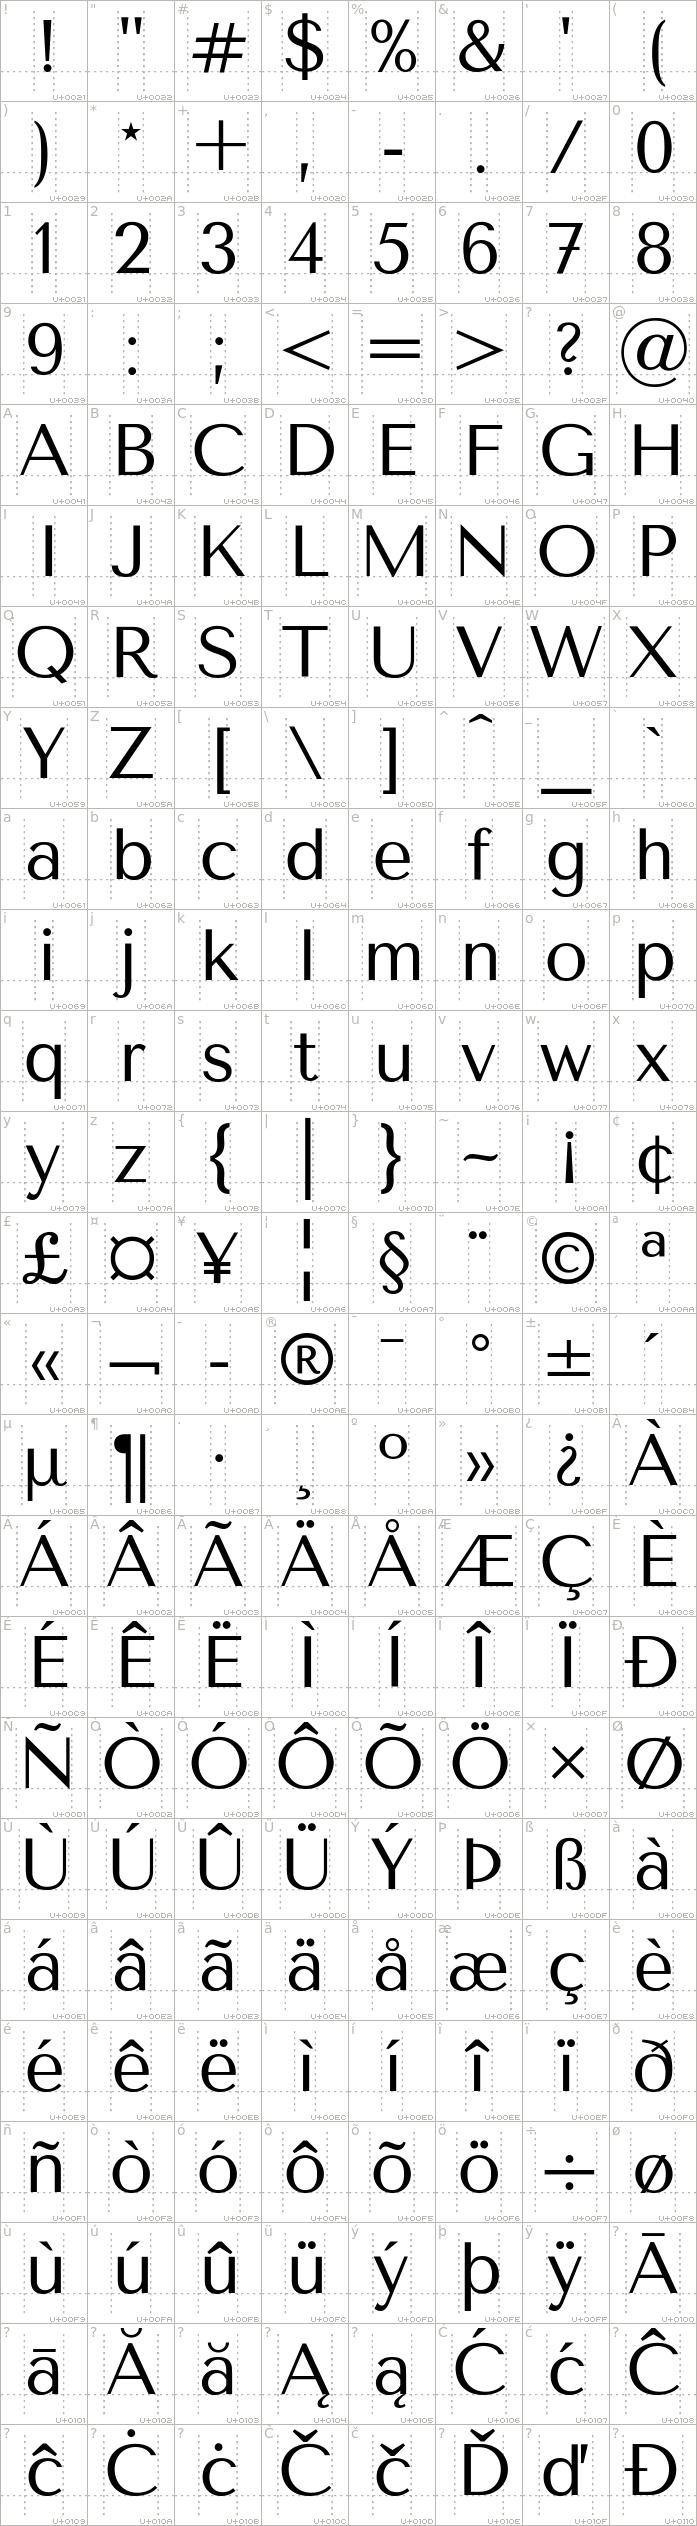 tenor-sans.regular.character-map-1